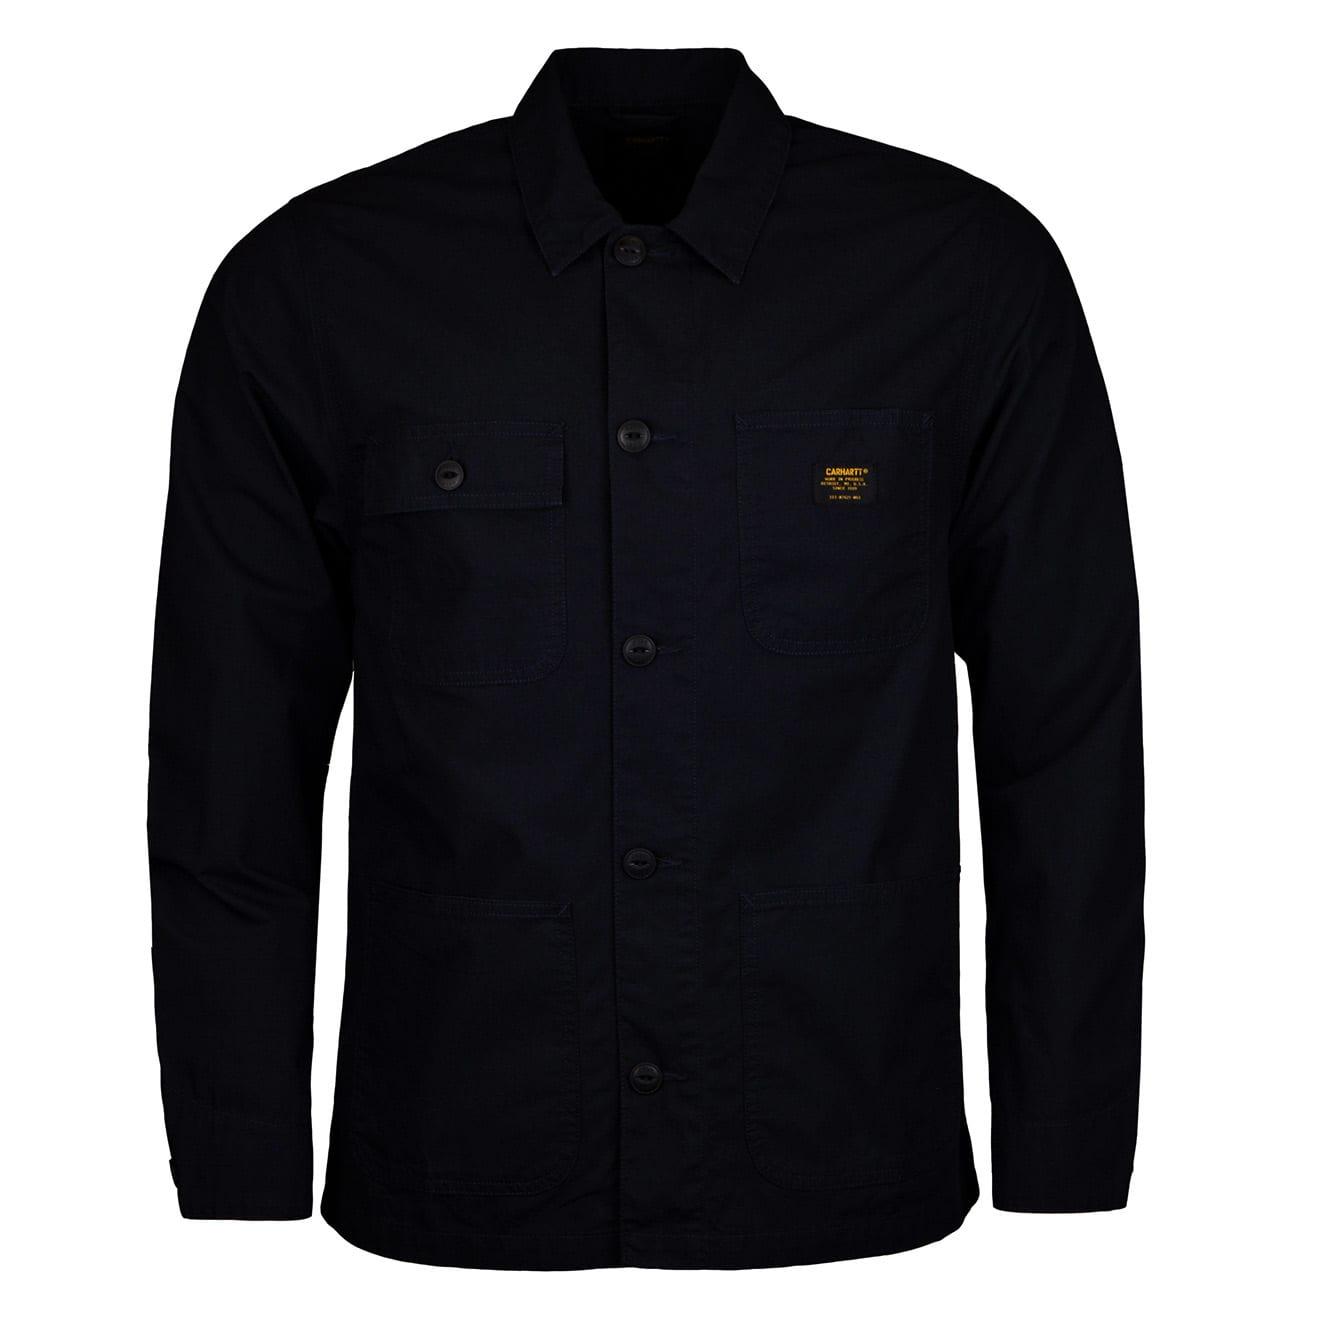 Carhartt Michigan Shirt Jacket The Sporting Lodge